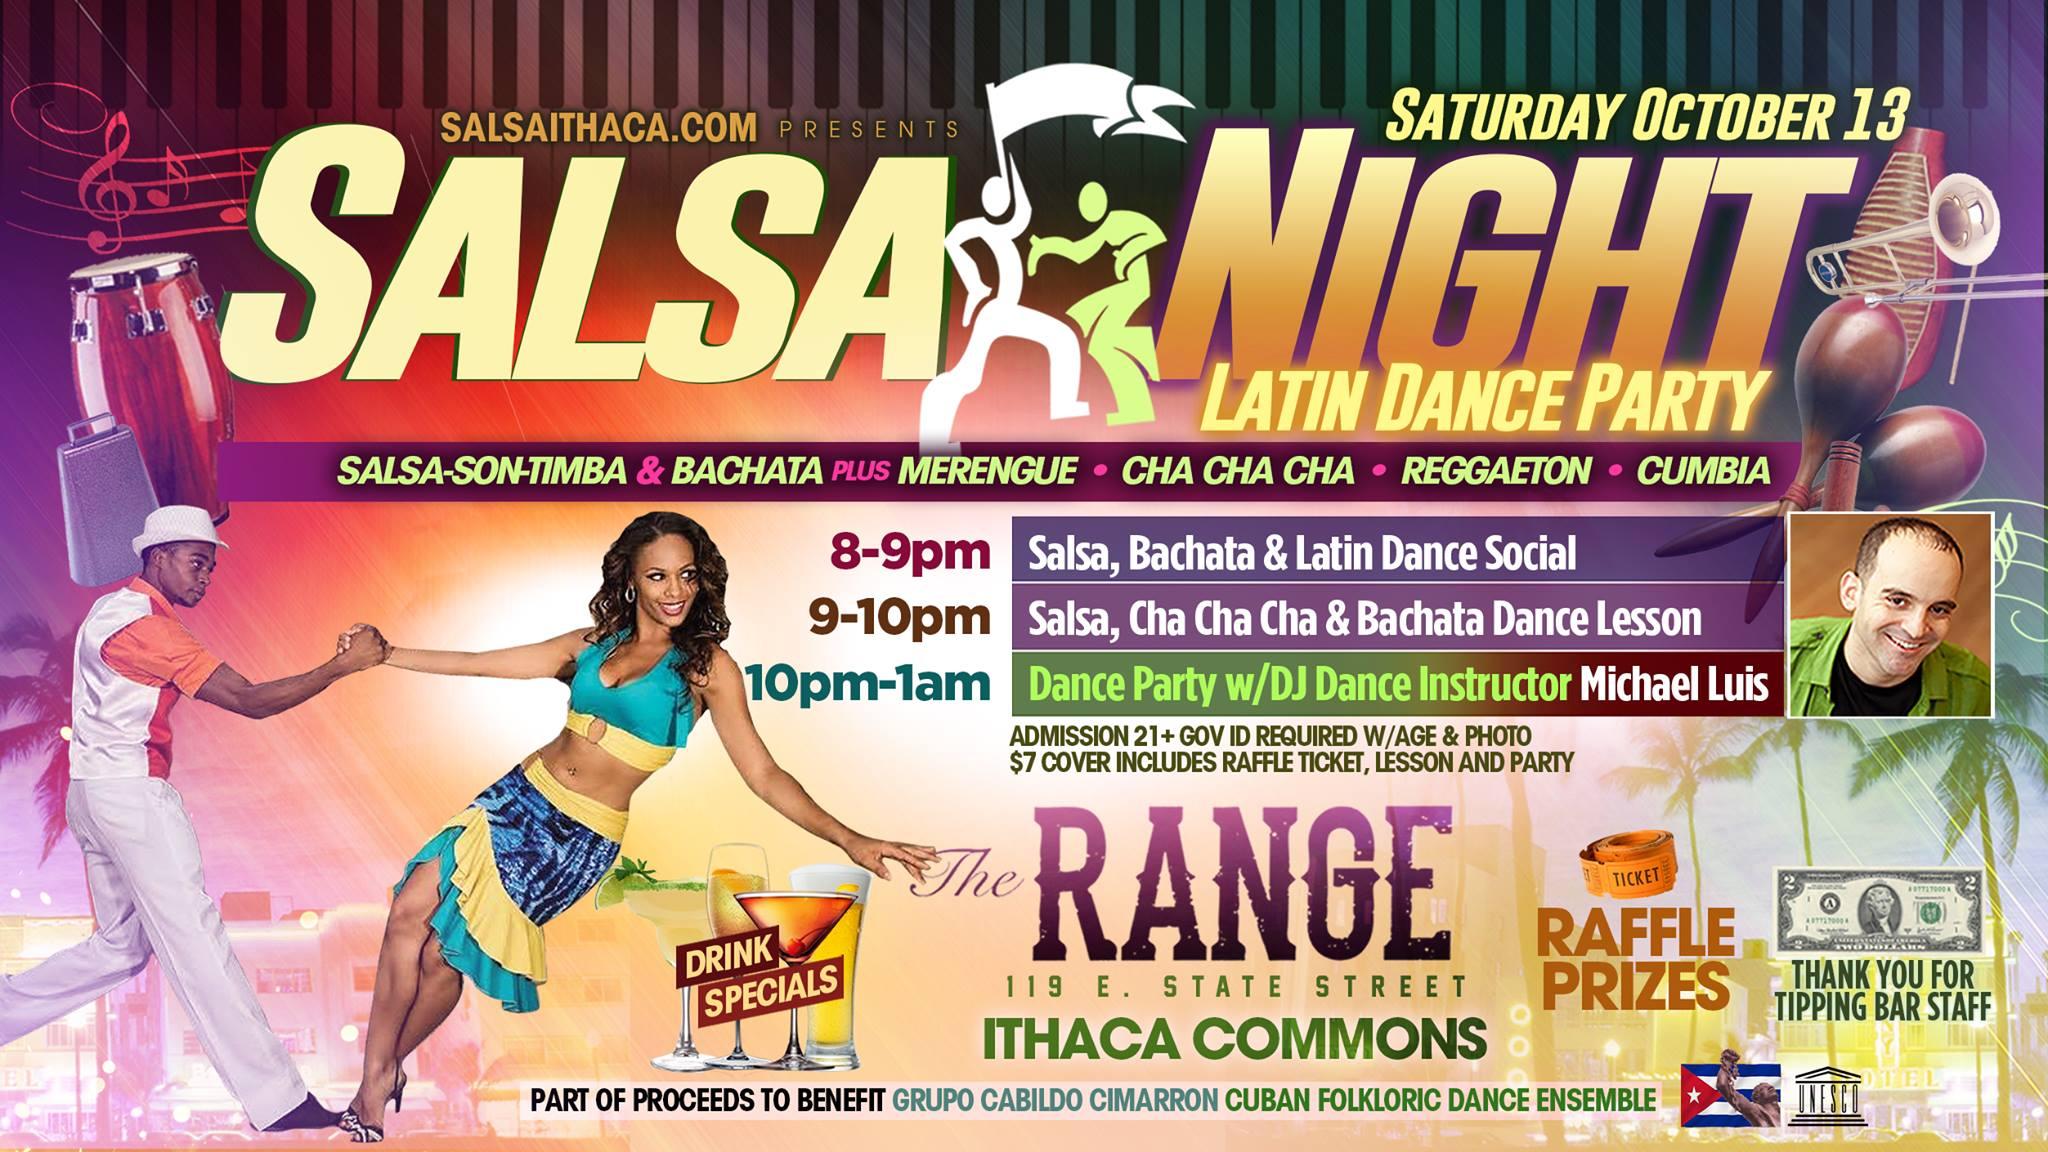 Salsa Night at The Range